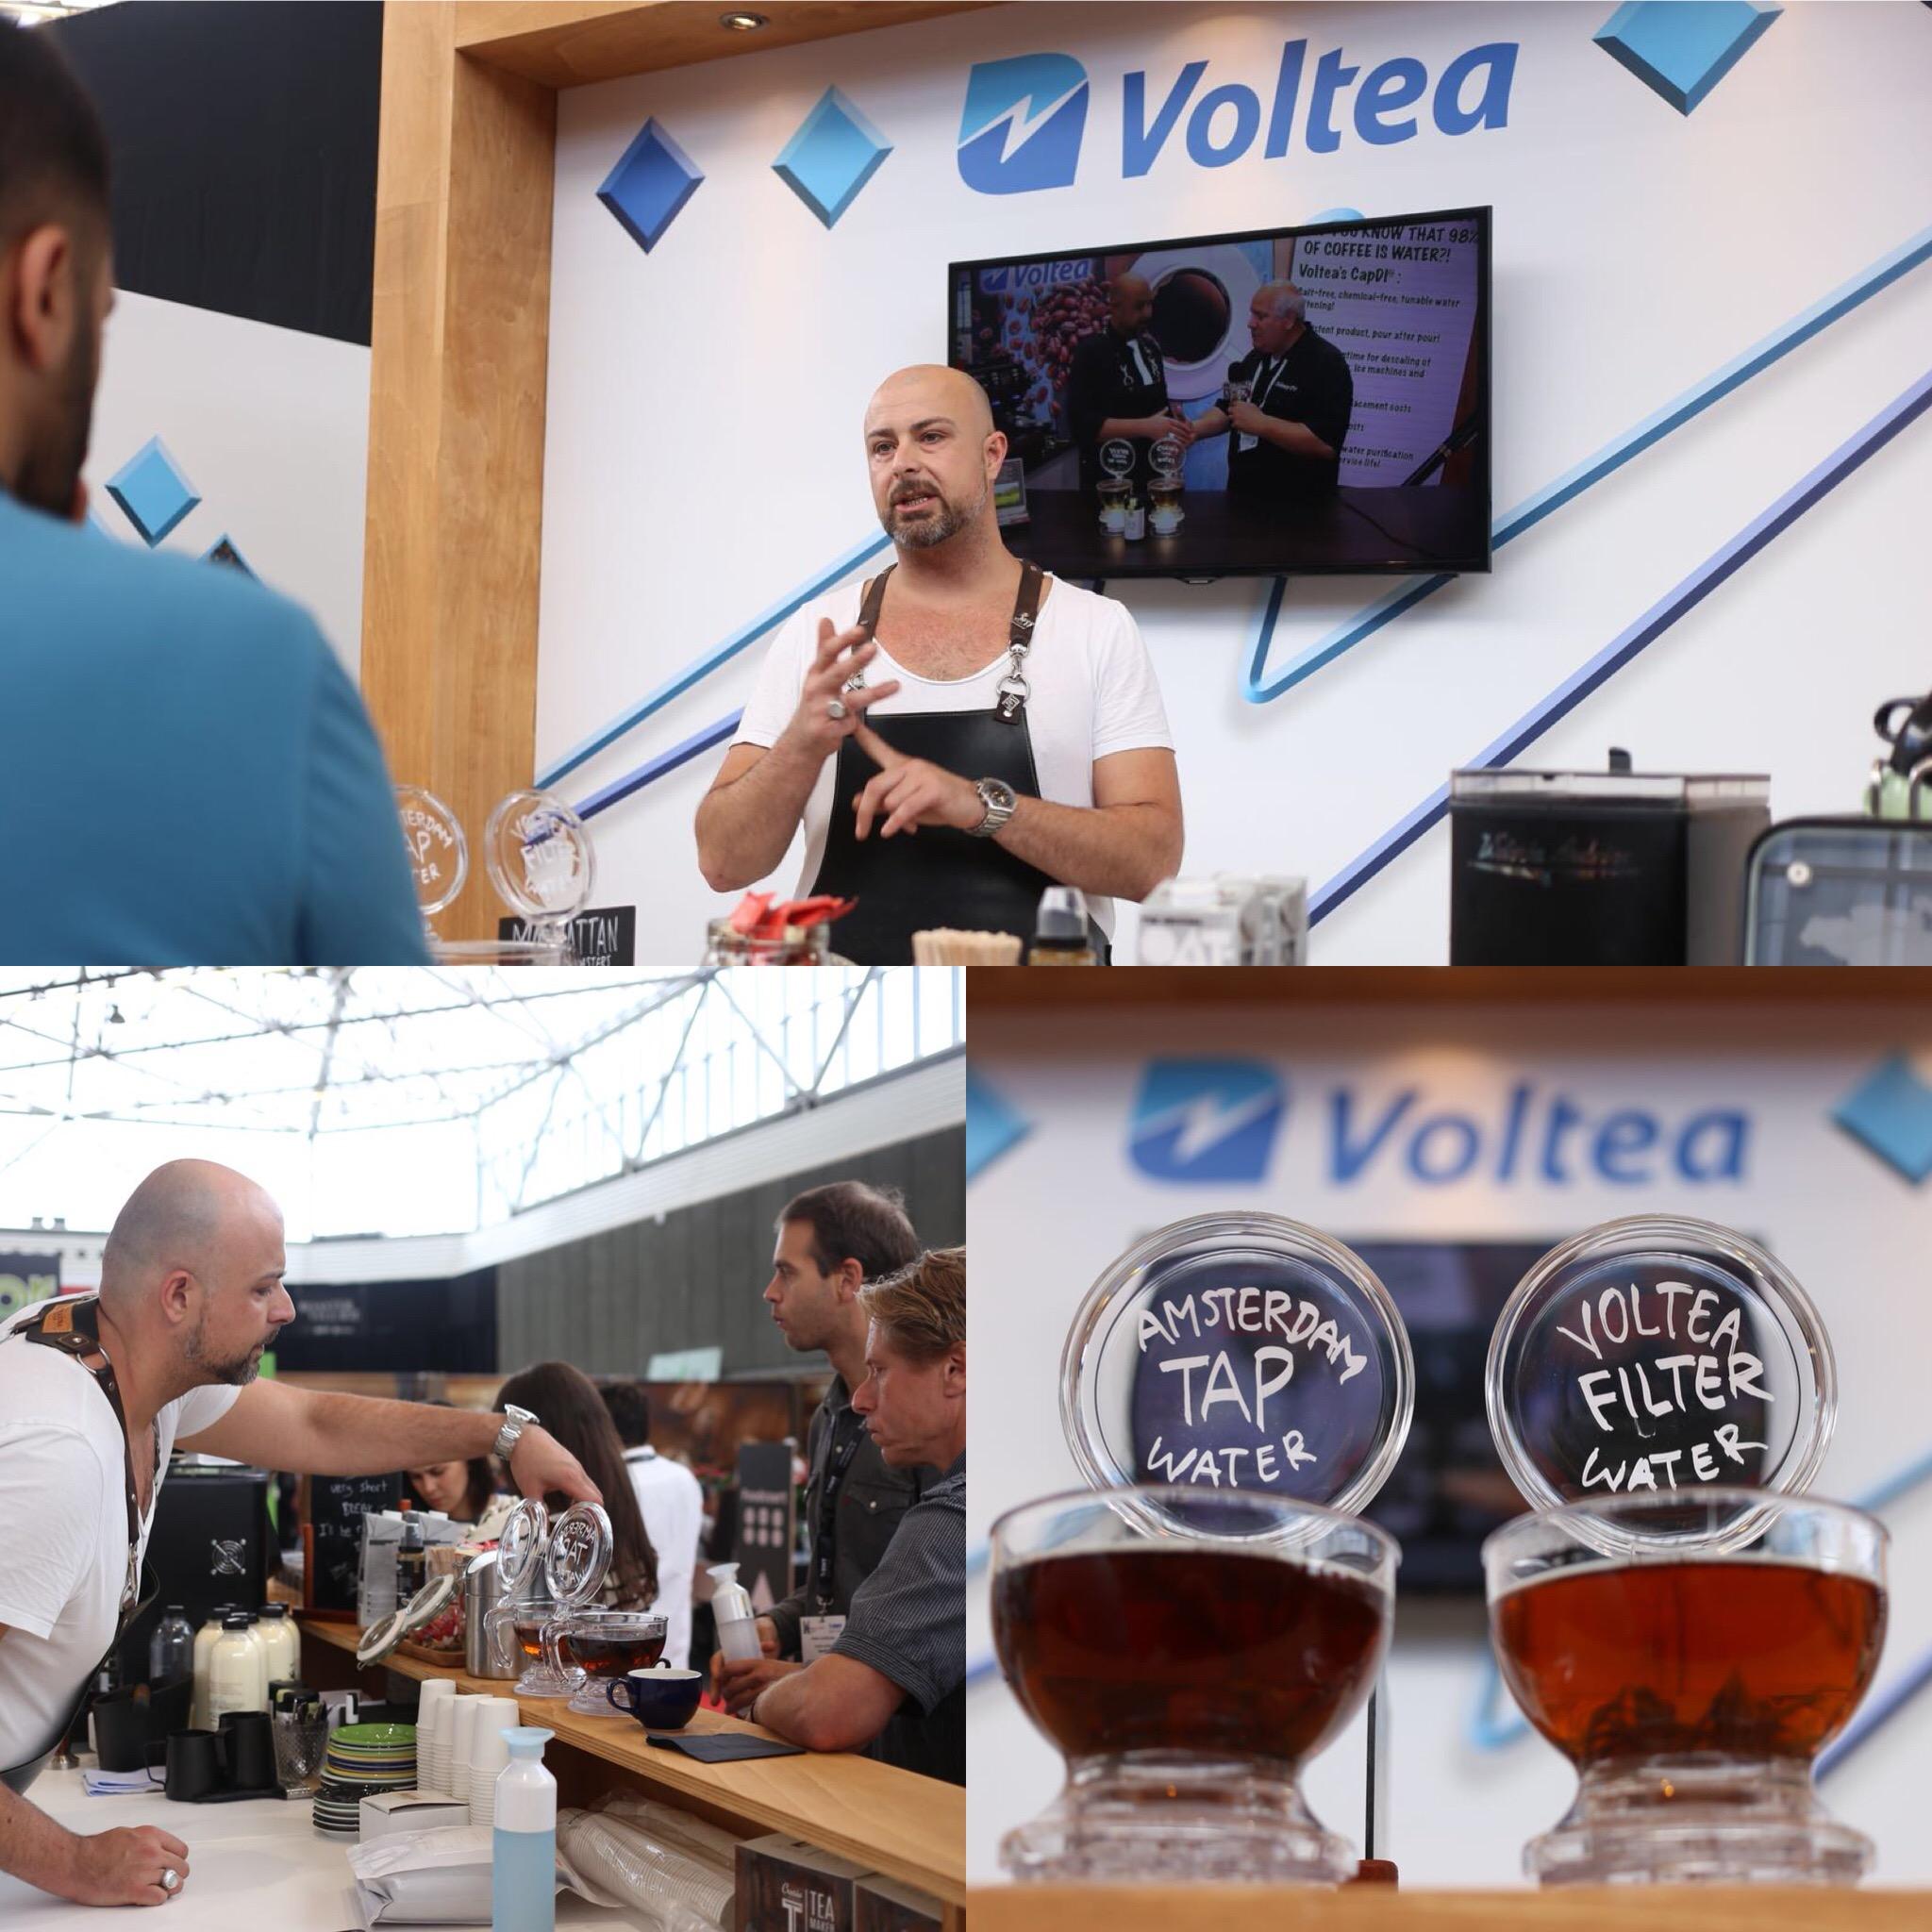 Voltea WOC Amsterdam 2018